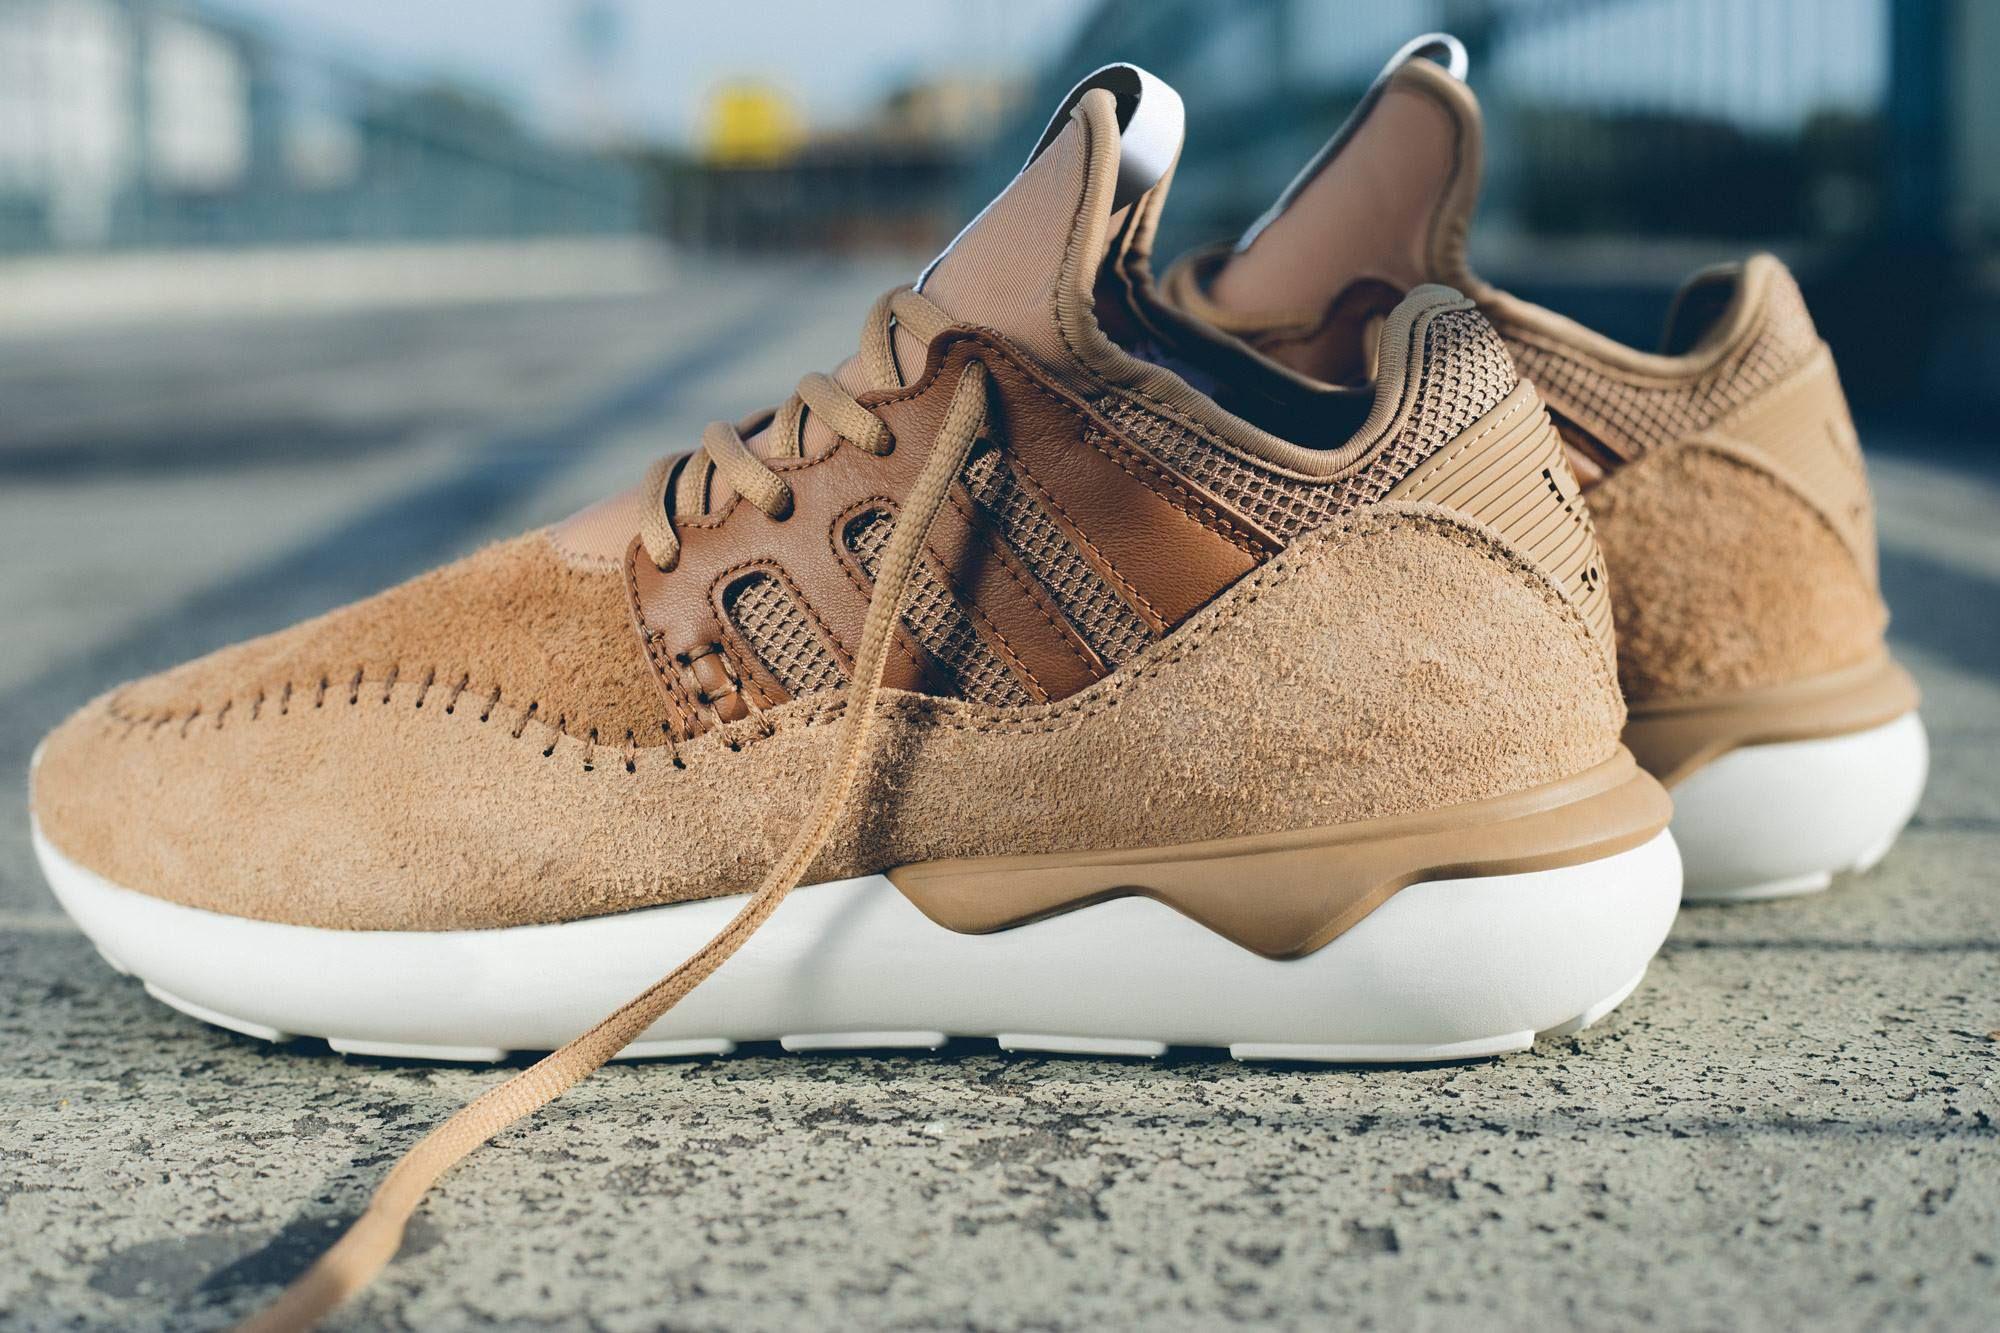 online store e0bf1 e11c6 get adidas tubular runner tan 8d269 4f19f